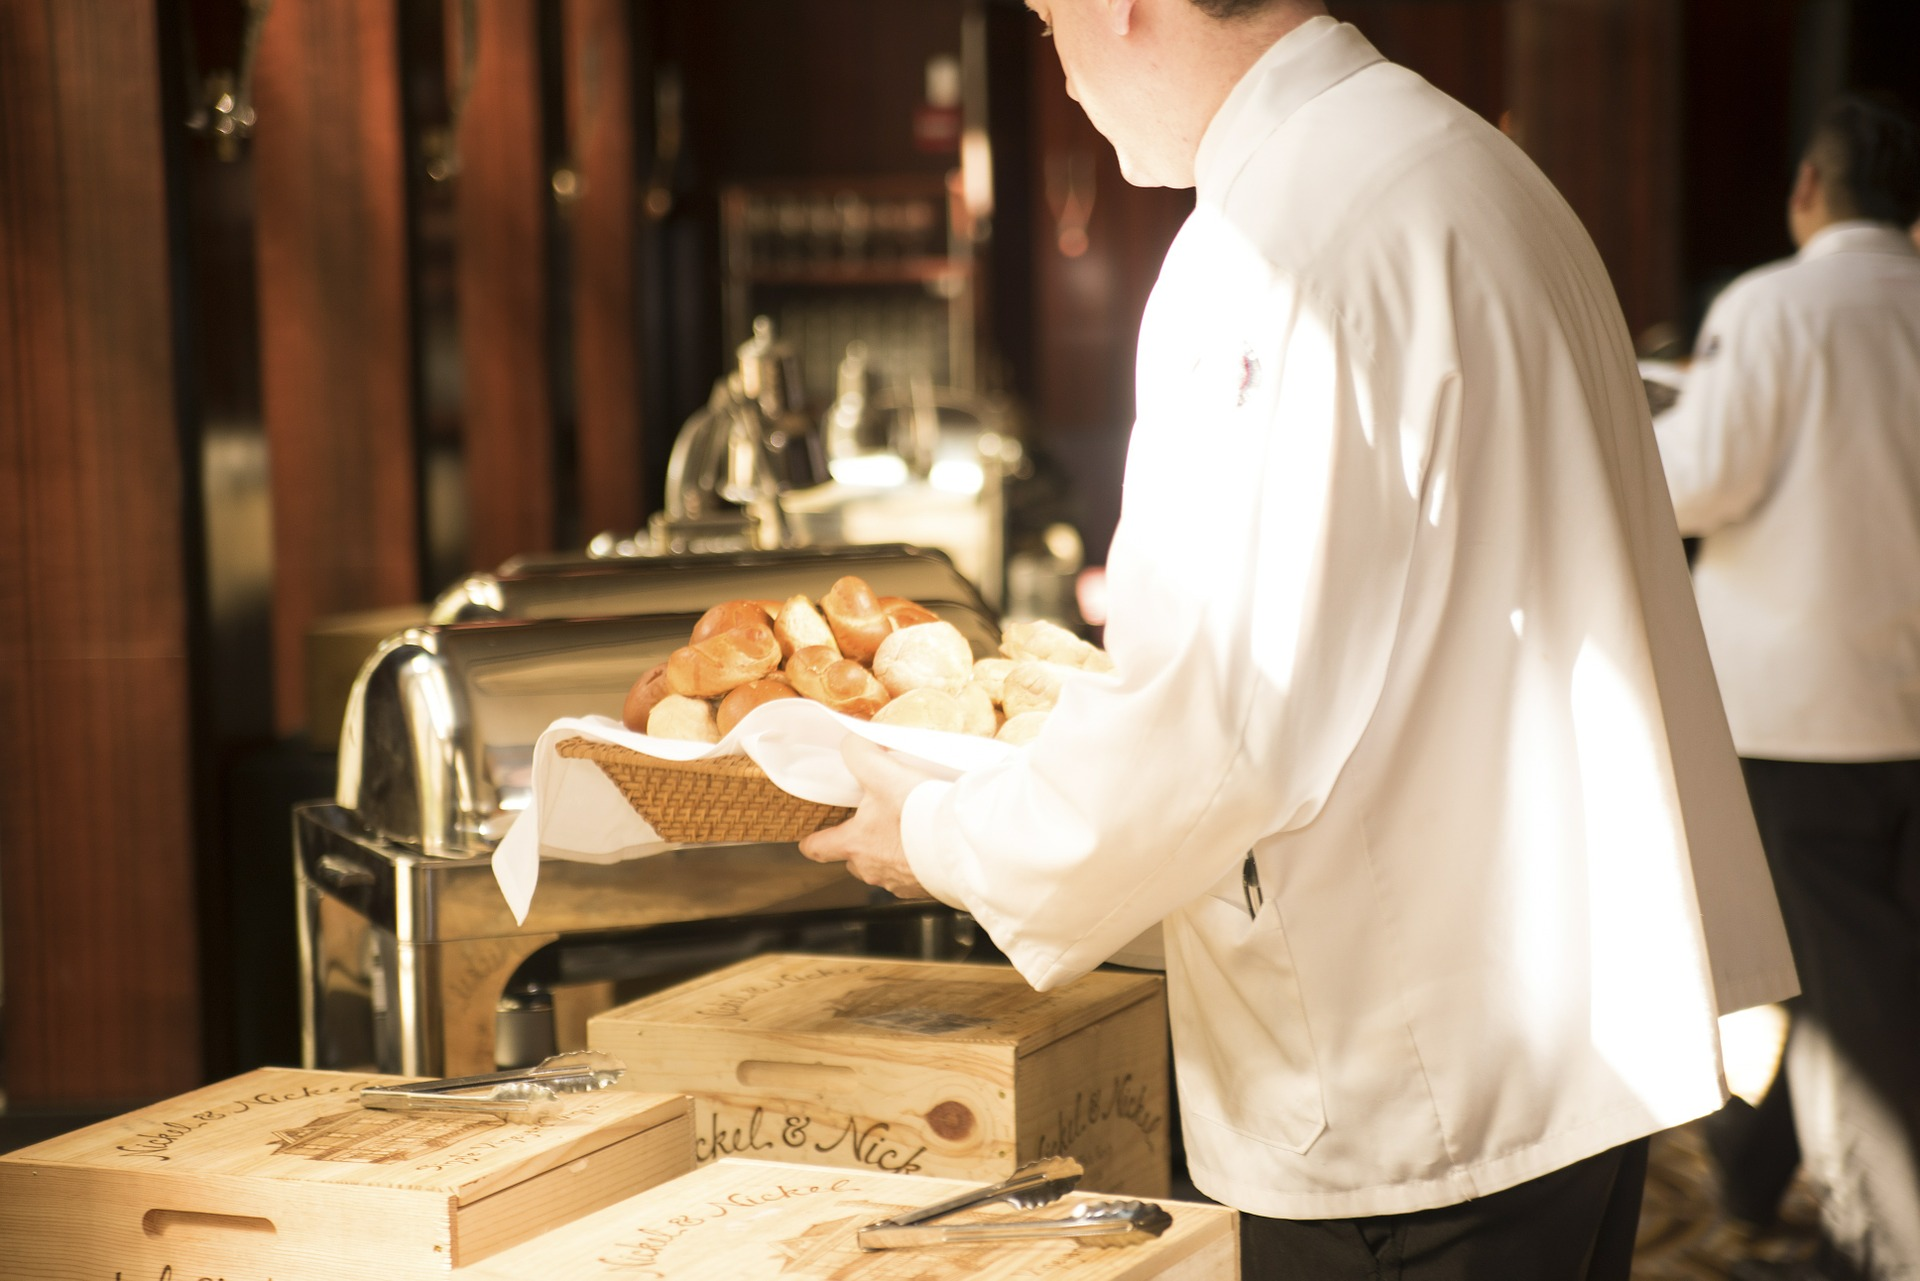 posluga, konobar, ugostiteljstvo, objekat, gost